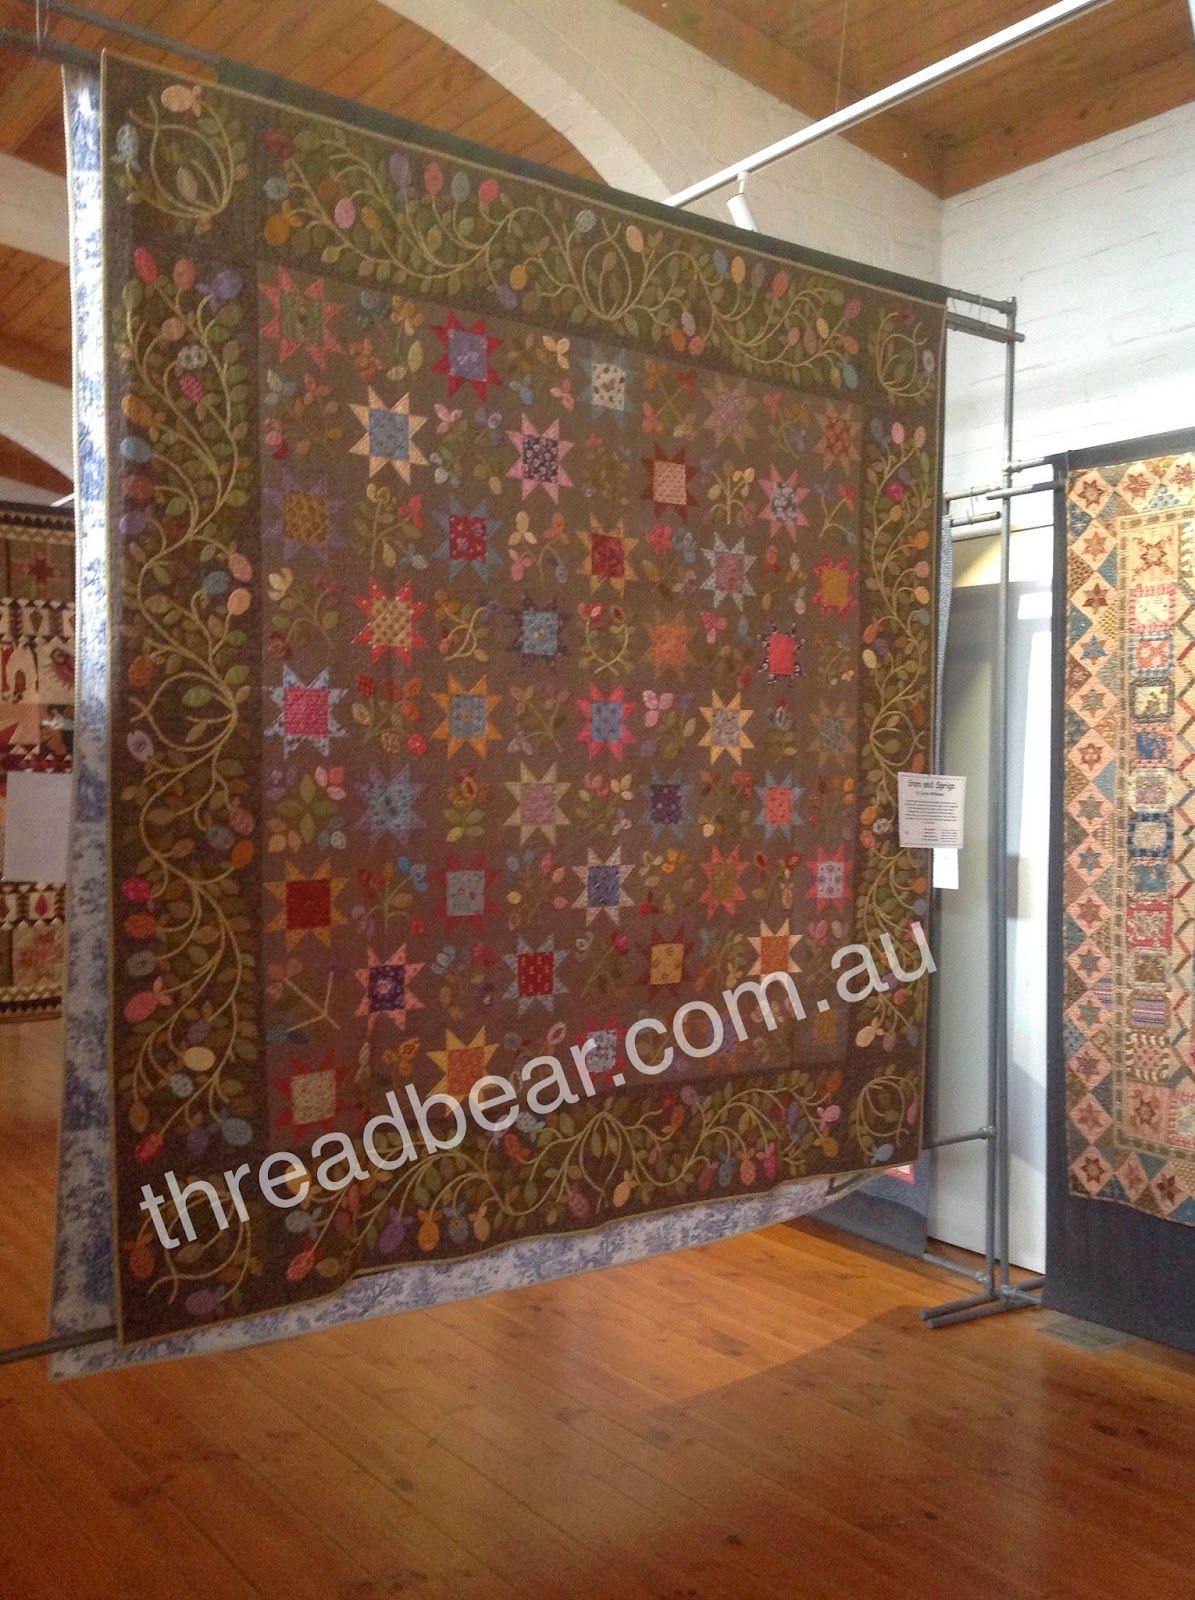 Threadbear: THANK YOU. From Castlemaine Quilt Exhibition Stars and ... : threadbear quilts - Adamdwight.com